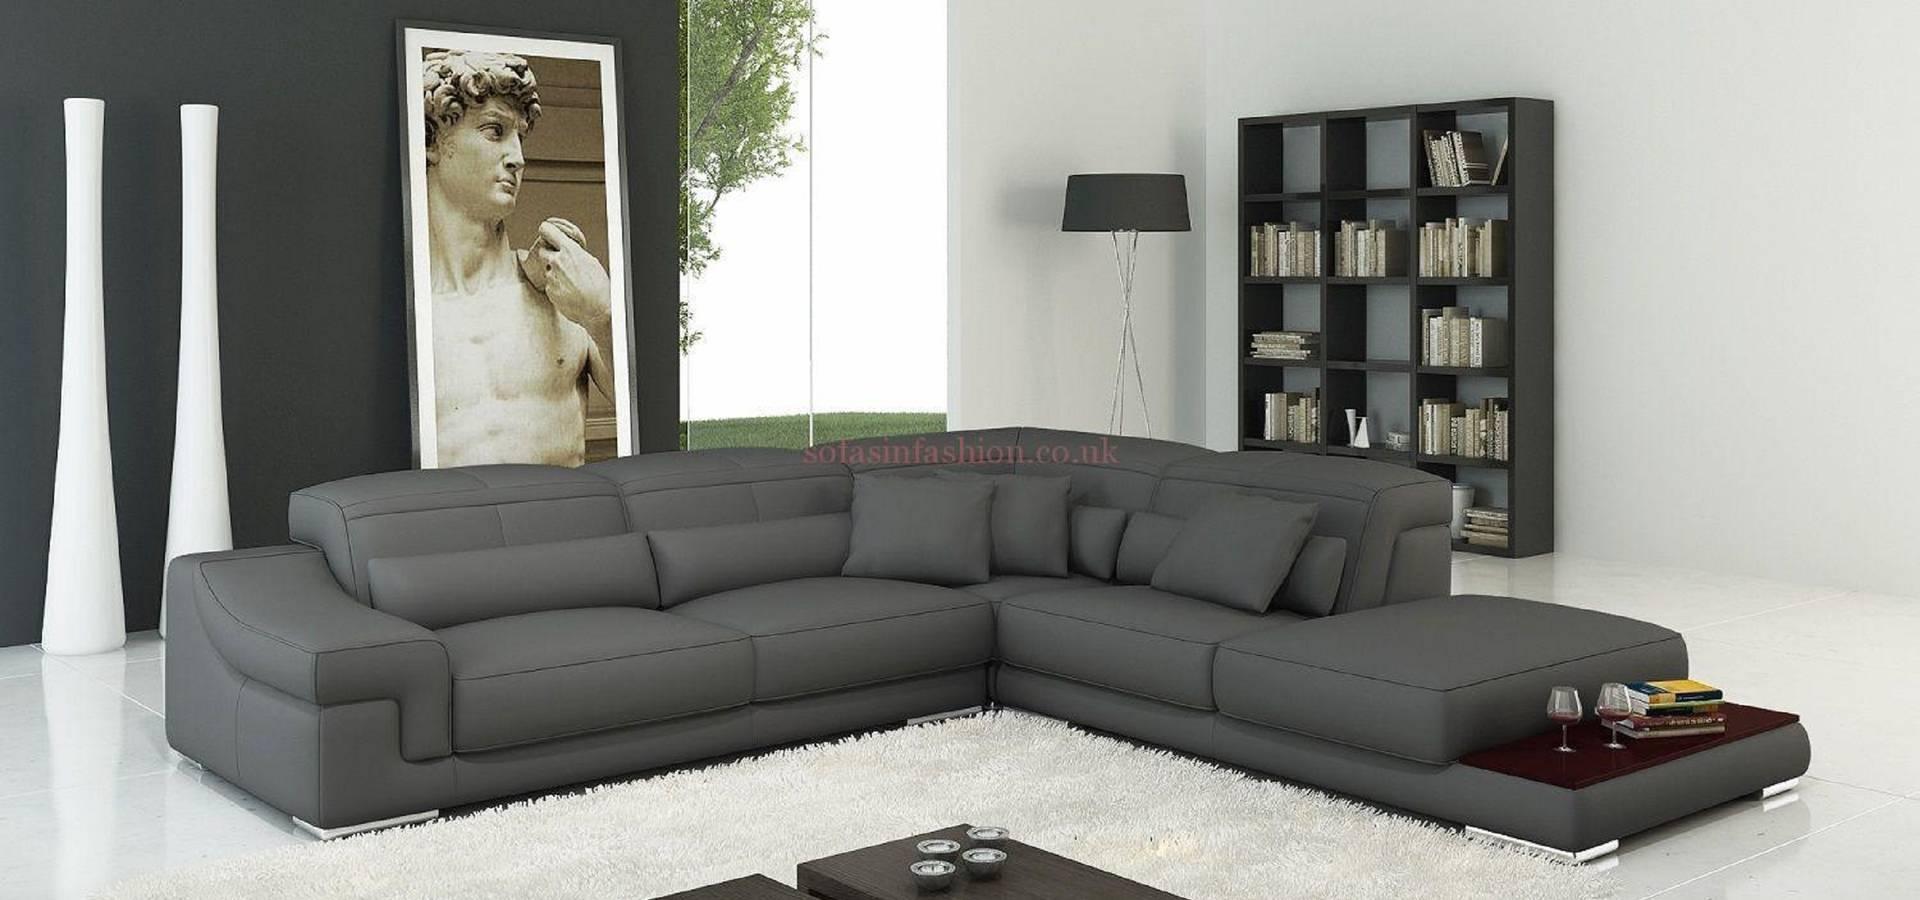 Crushed Velvet Corner Chesterfield Sofa Von Sofas In Fashion Homify